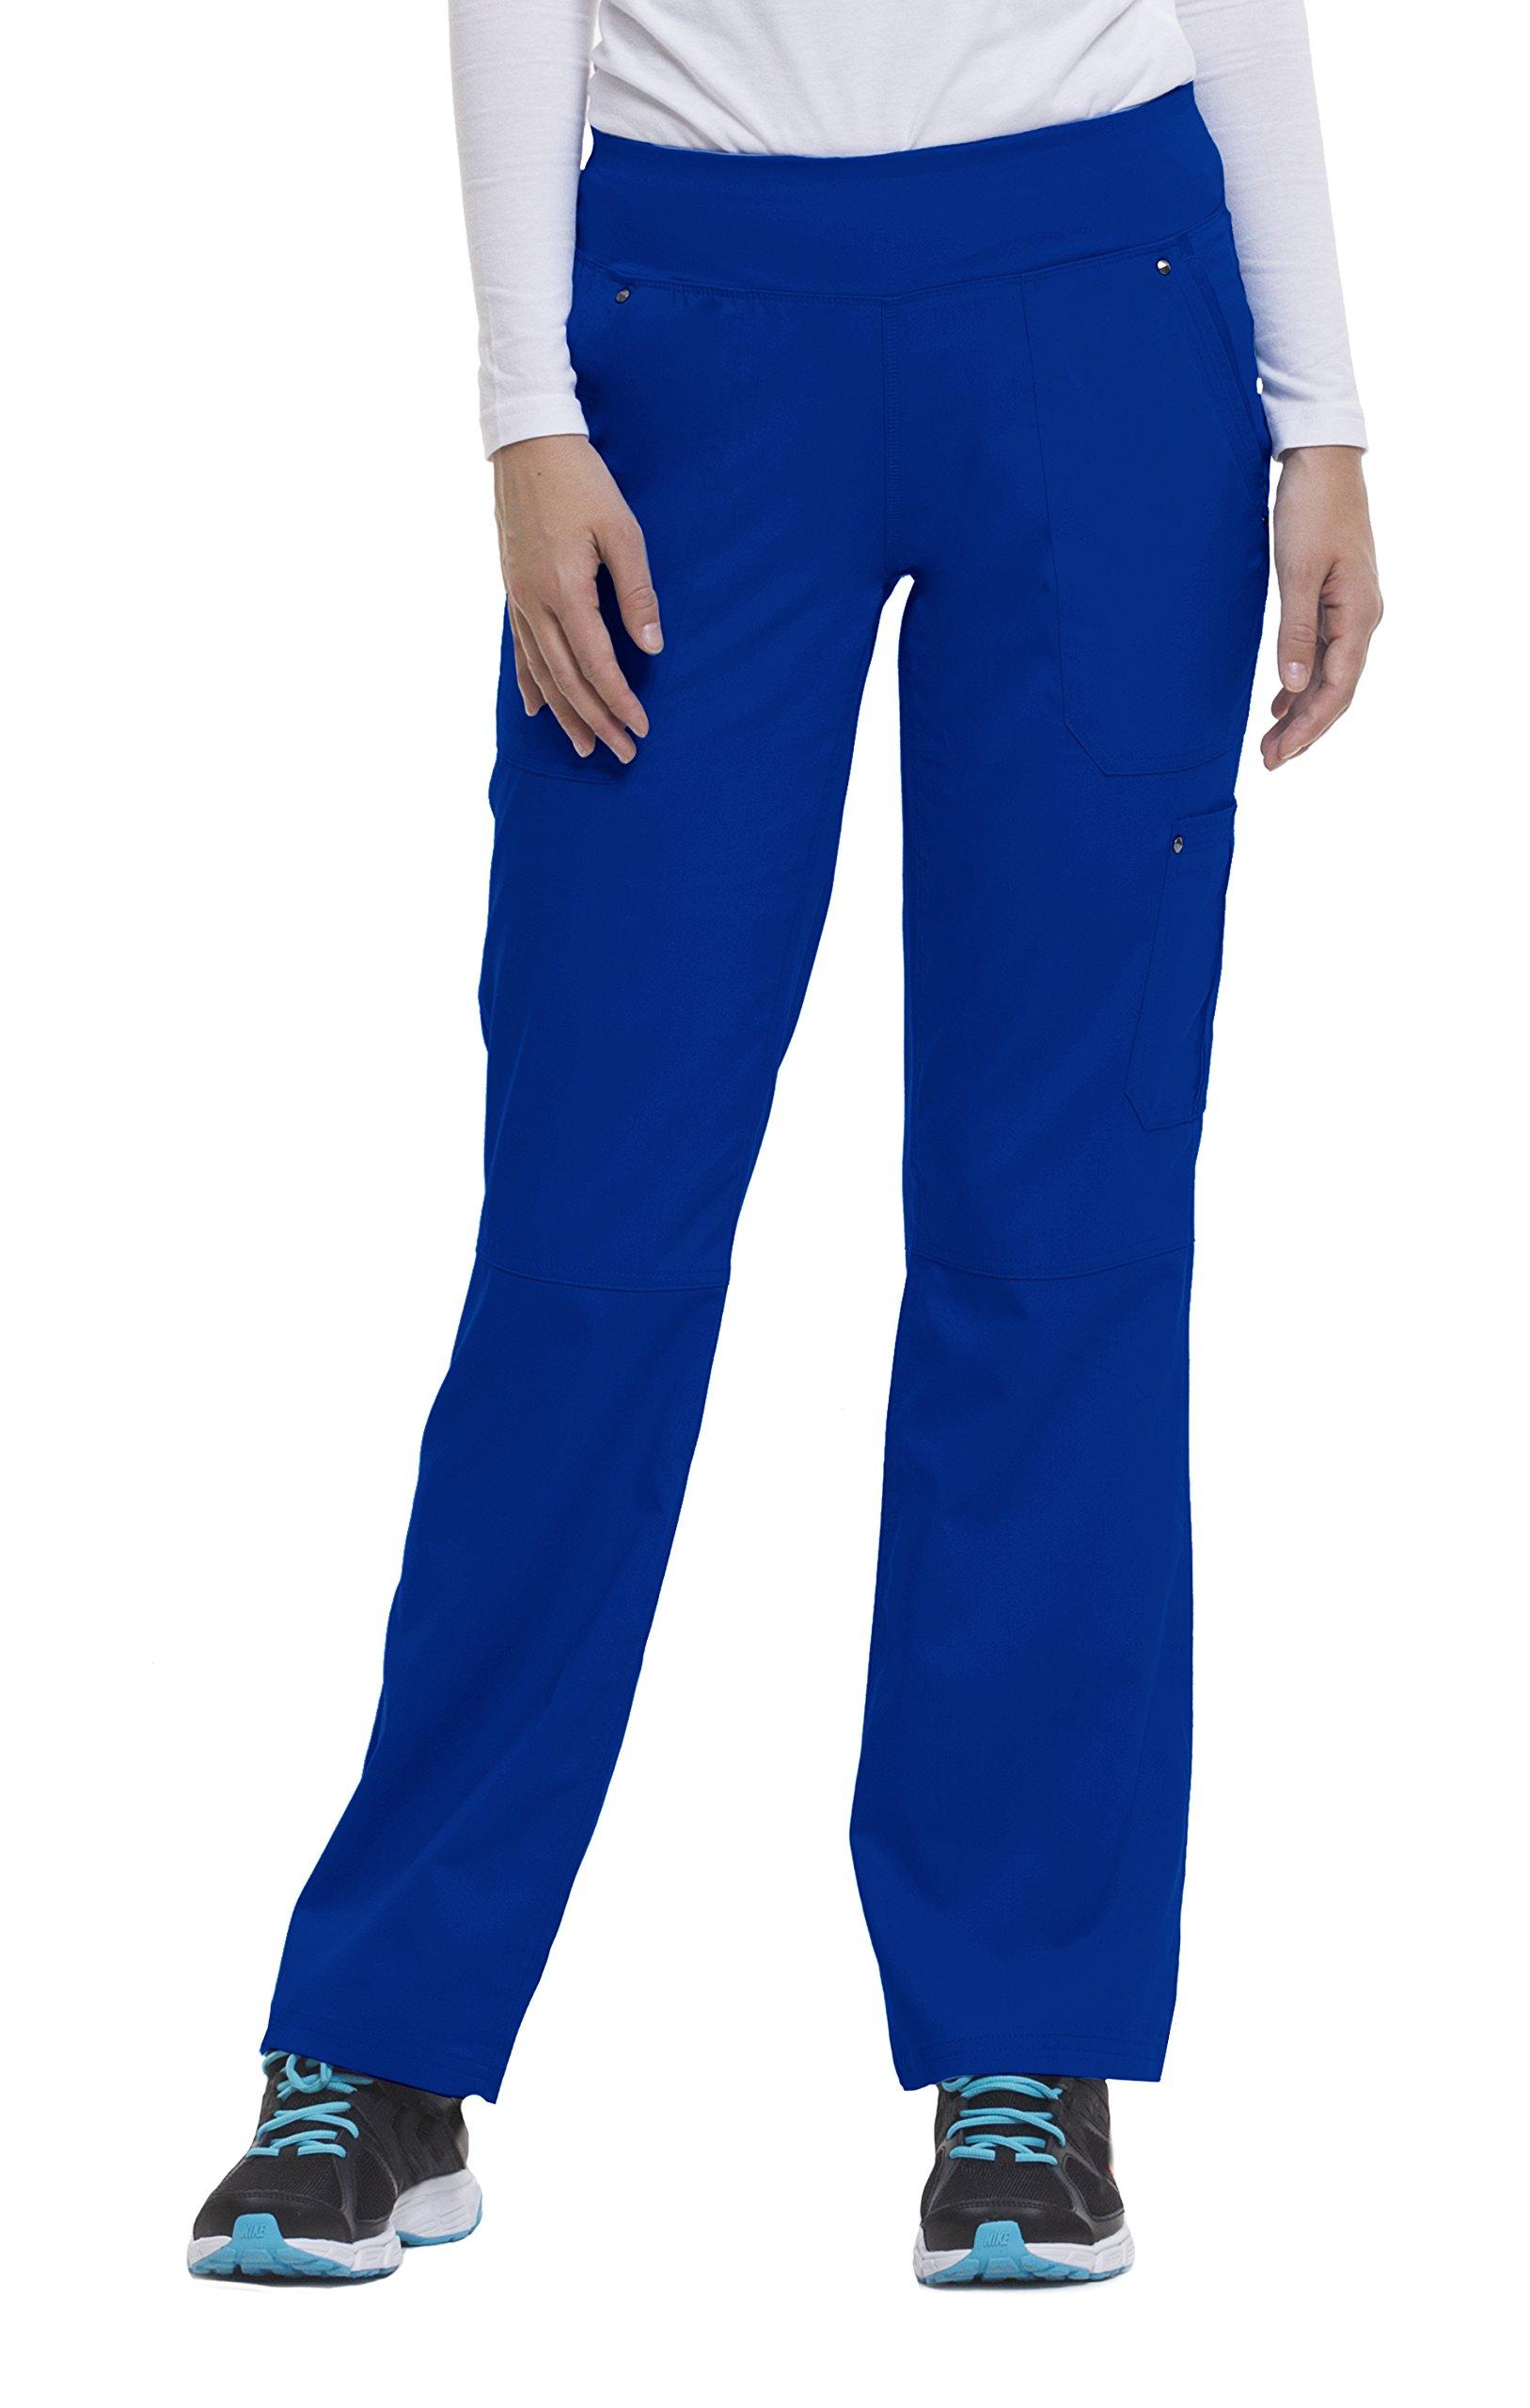 Healing Hands Purple Label Yoga Women's Tori 9133 5 Pocket Knit Waist Pant Galaxy Blue- Medium